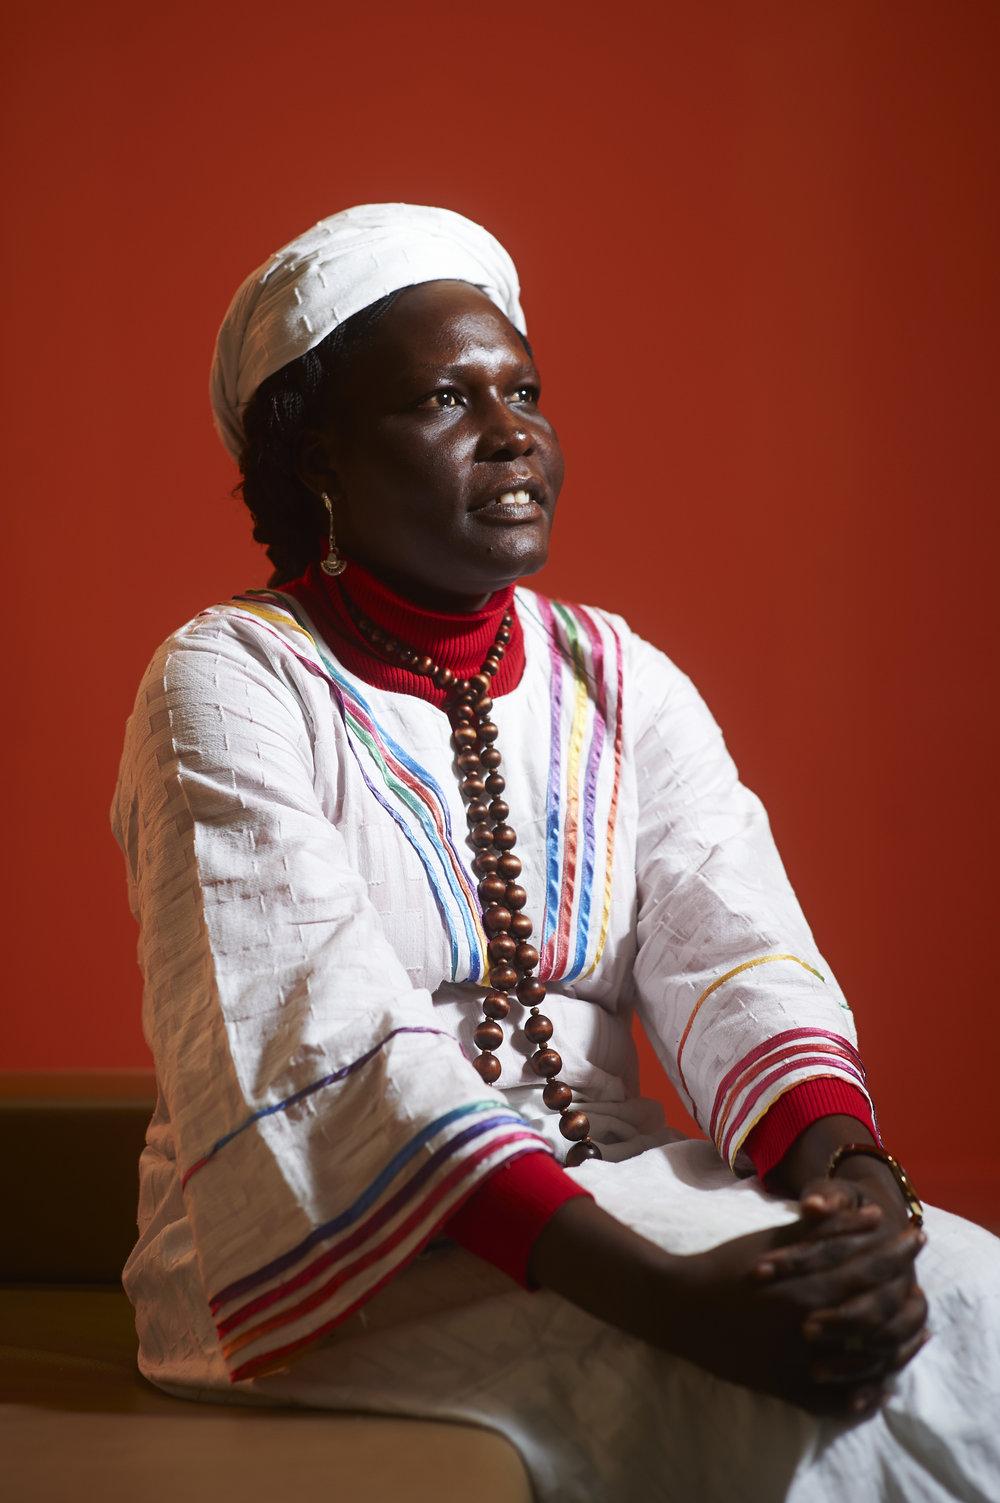 Denyok, Karak (Human Rights Defender from South Sudan) - by J Houlihan (Autumn 2012) (18).jpg